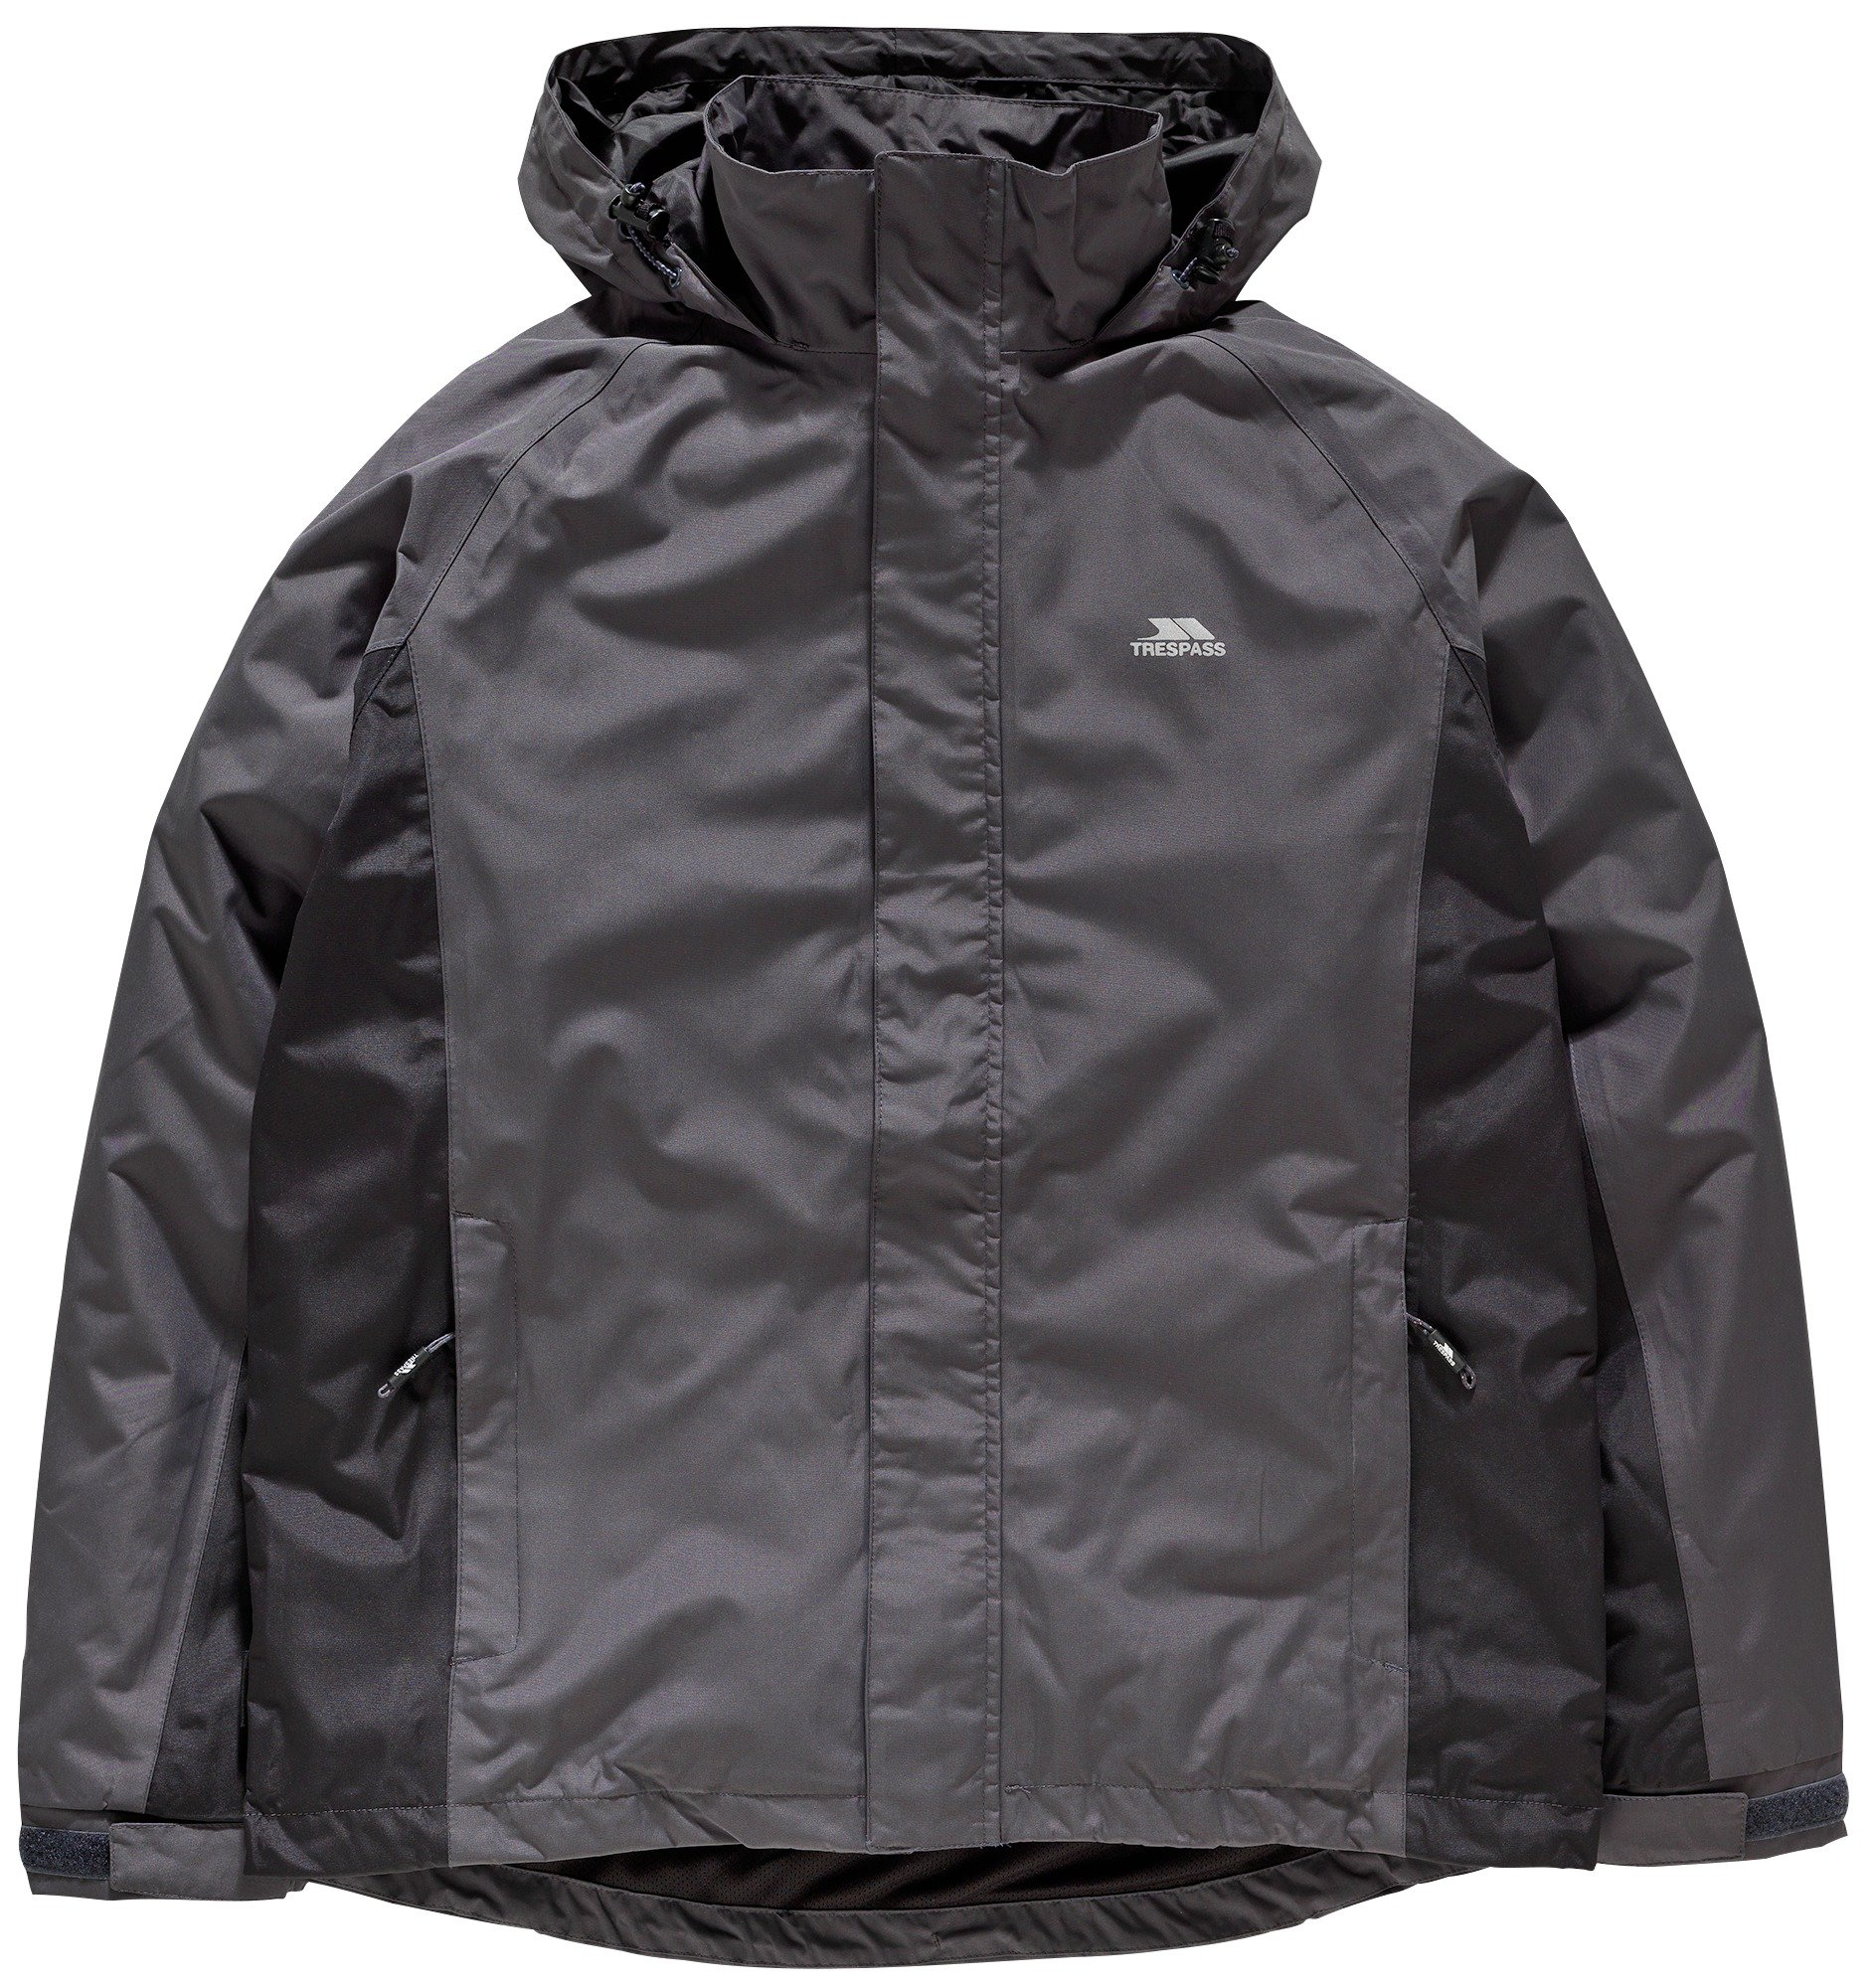 Image of Trespass Grey Rogan II Jacket - Medium